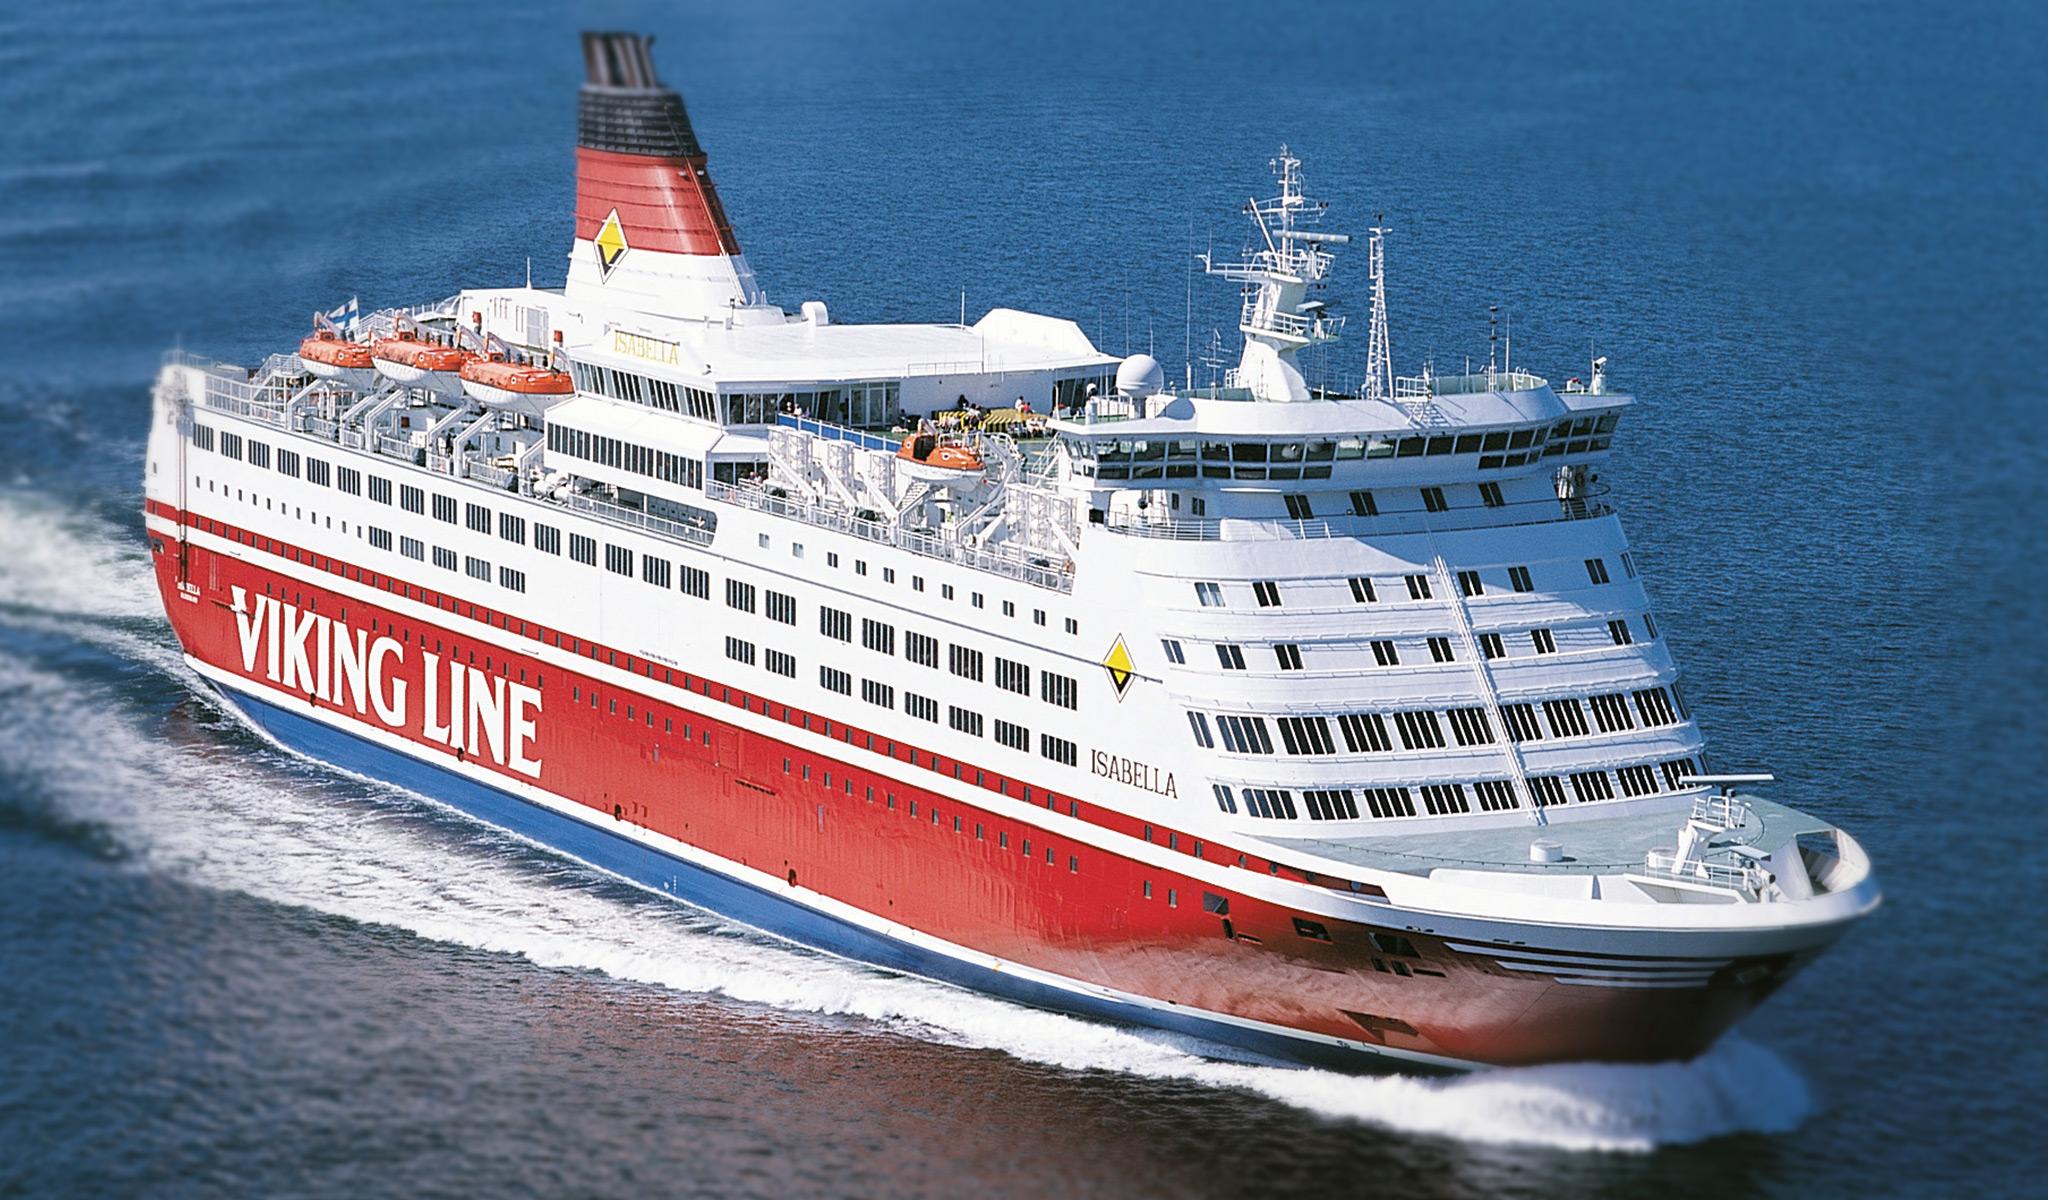 Viking Line Palaute